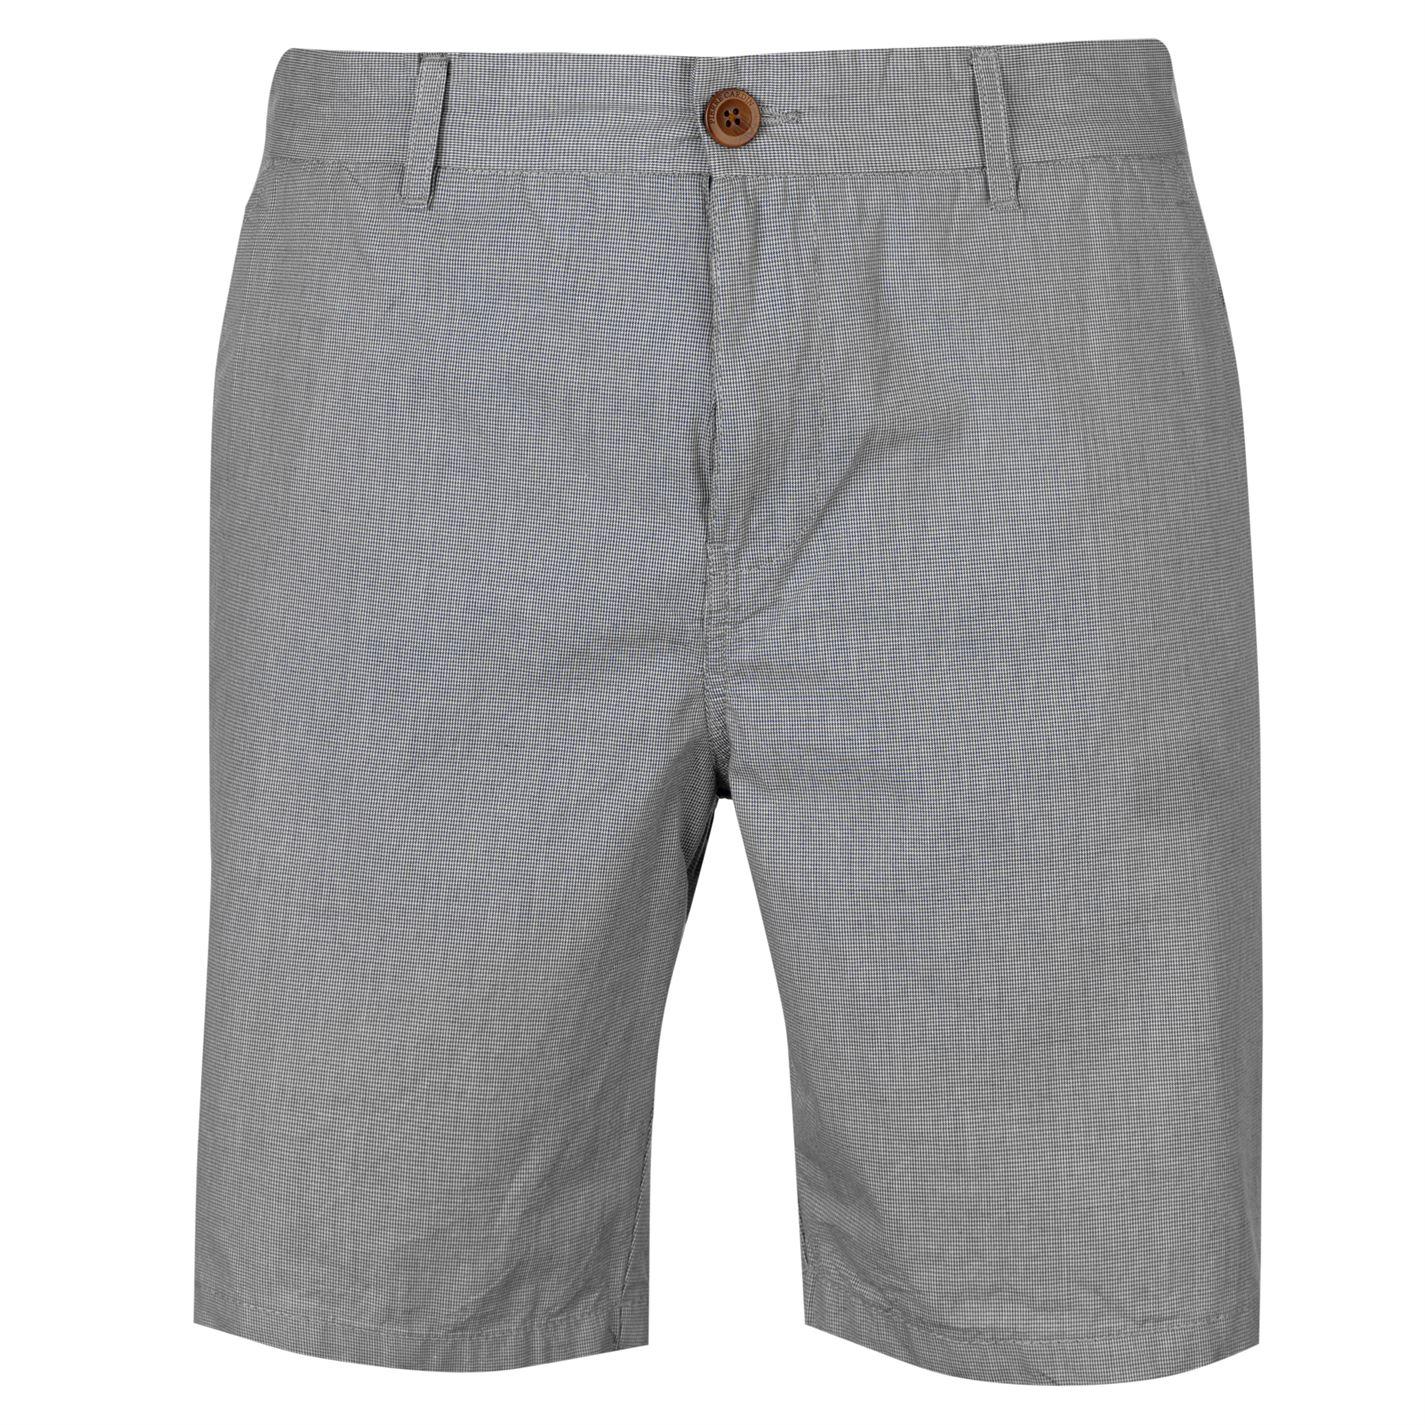 Pierre Cardin Mini Check Shorts Mens